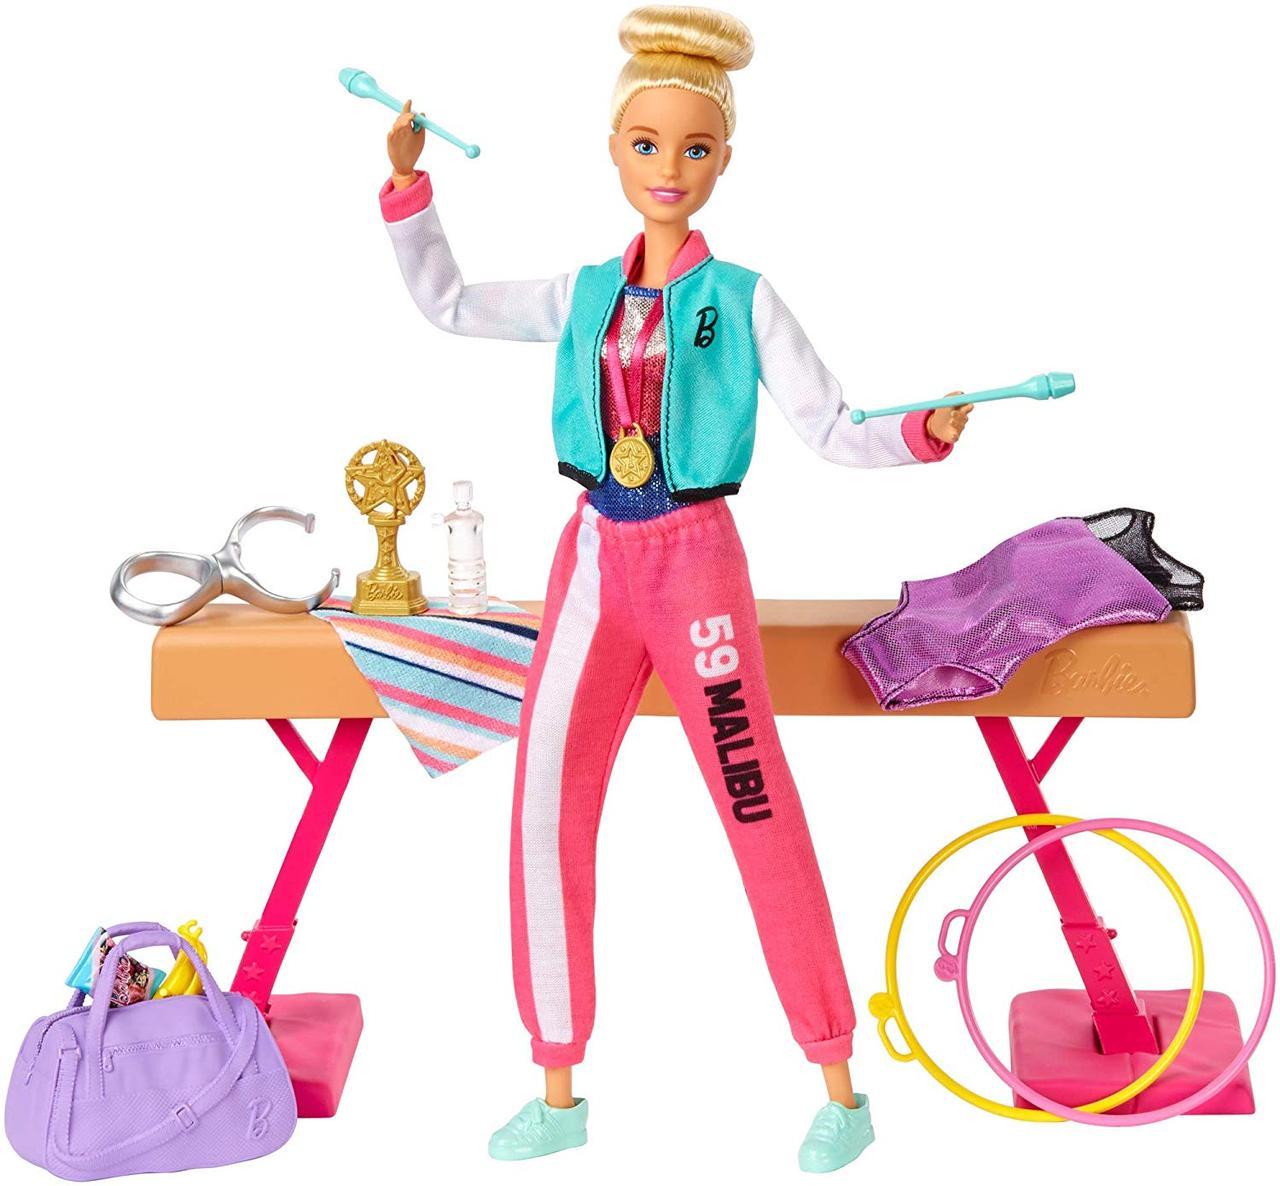 Набор Барби Гимнастика, Barbie Gymnastics Playset, Mattel Оригинал из США